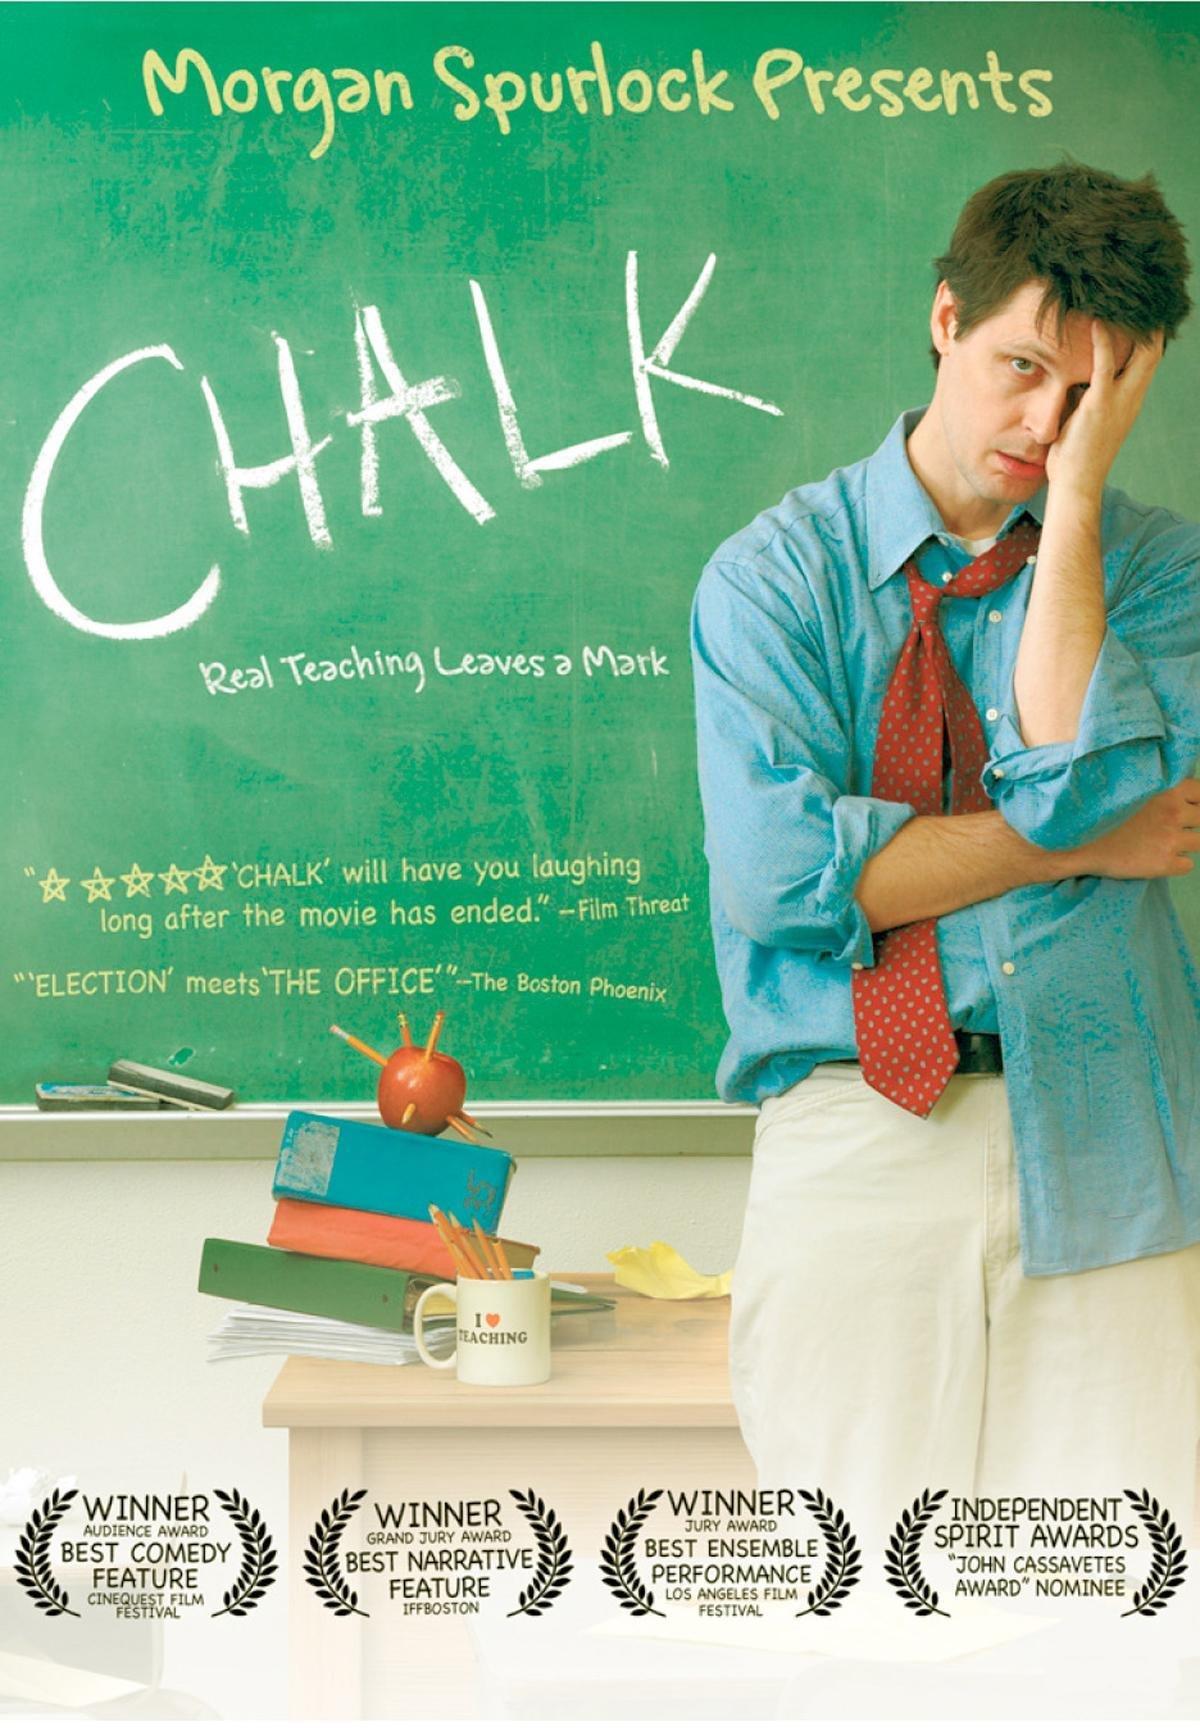 Amazon.com: Chalk - Morgan Spurlock Presents: Mike Akel, Chris Mass, Joe Amodei, David Gonzales: Amazon Digital Services LLC